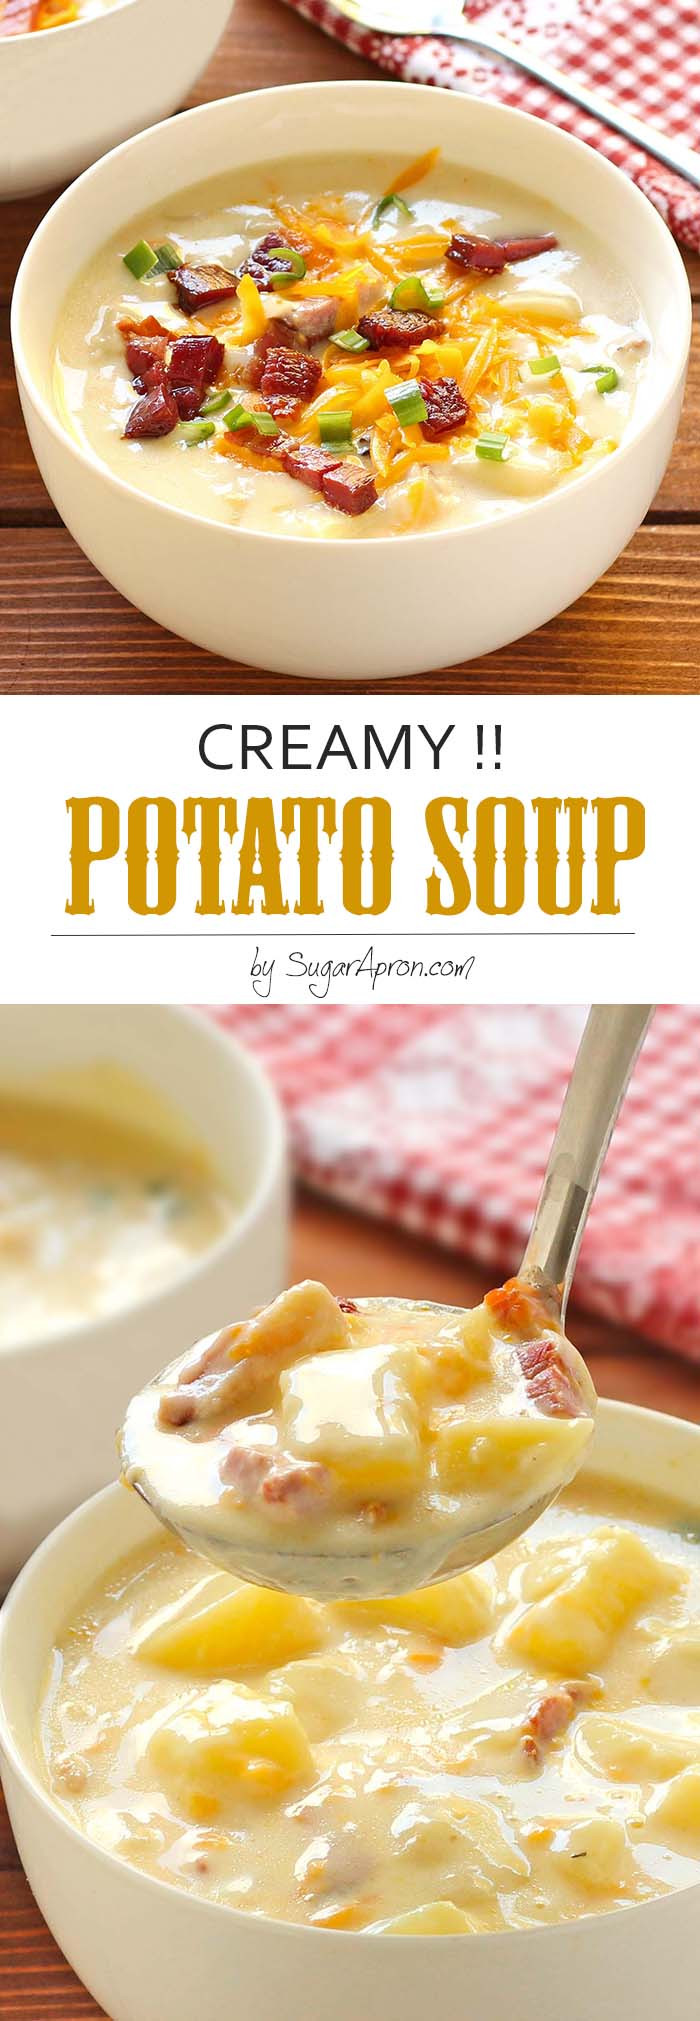 Creamy Potato Soup  Creamy Potato Soup Sugar Apron